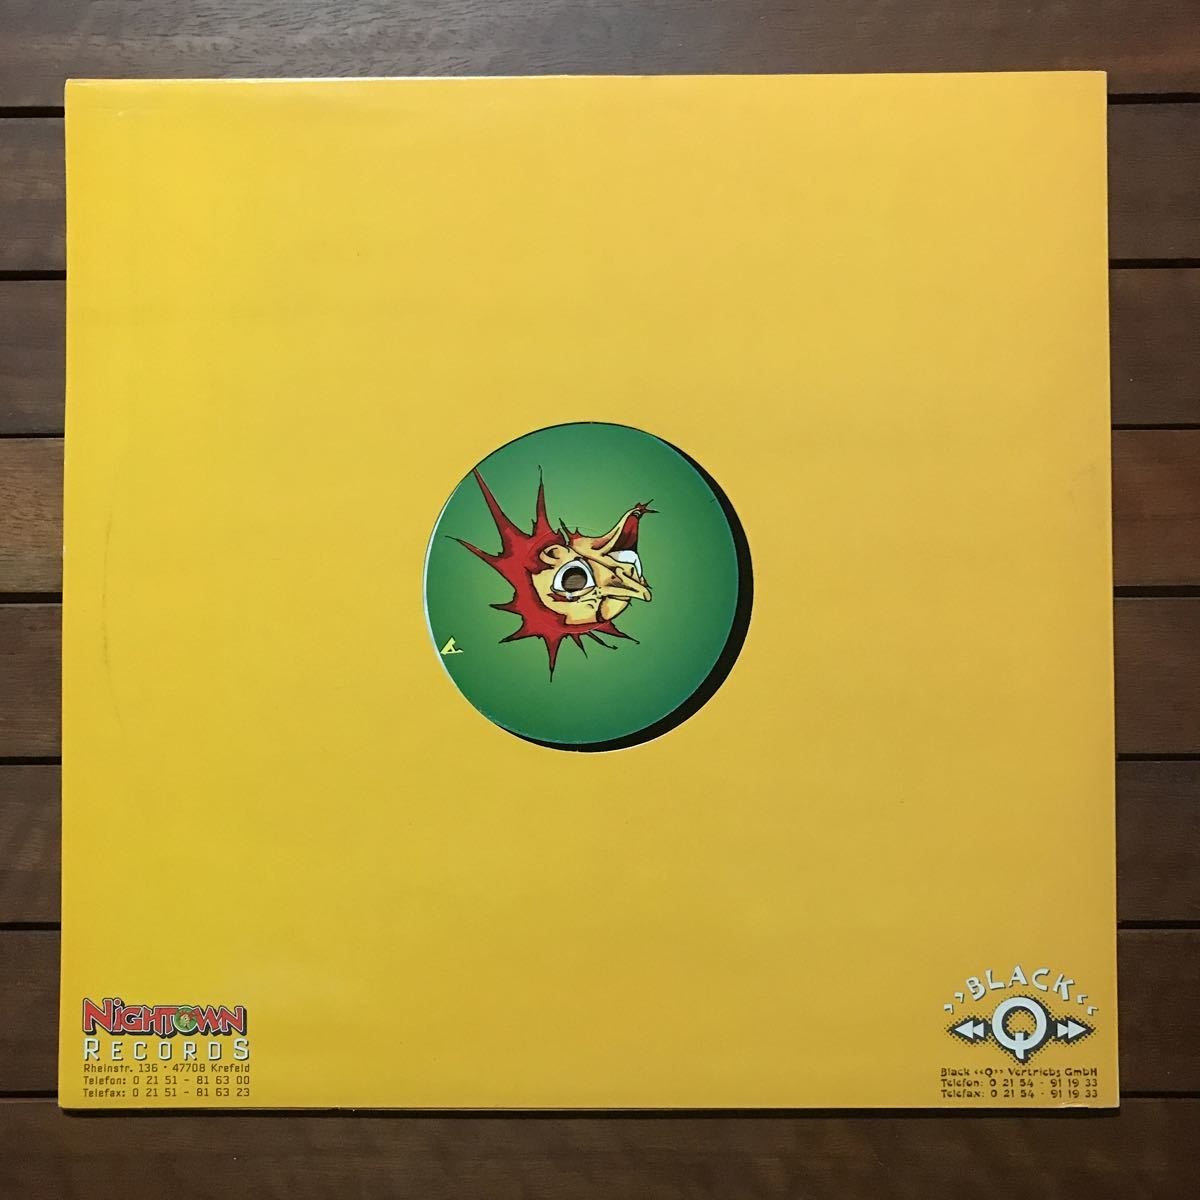 【eu-rap】Flip Da Scrip / Throw Ya Hands In The Air '95[12inch]オリジナル盤《3-2-77》